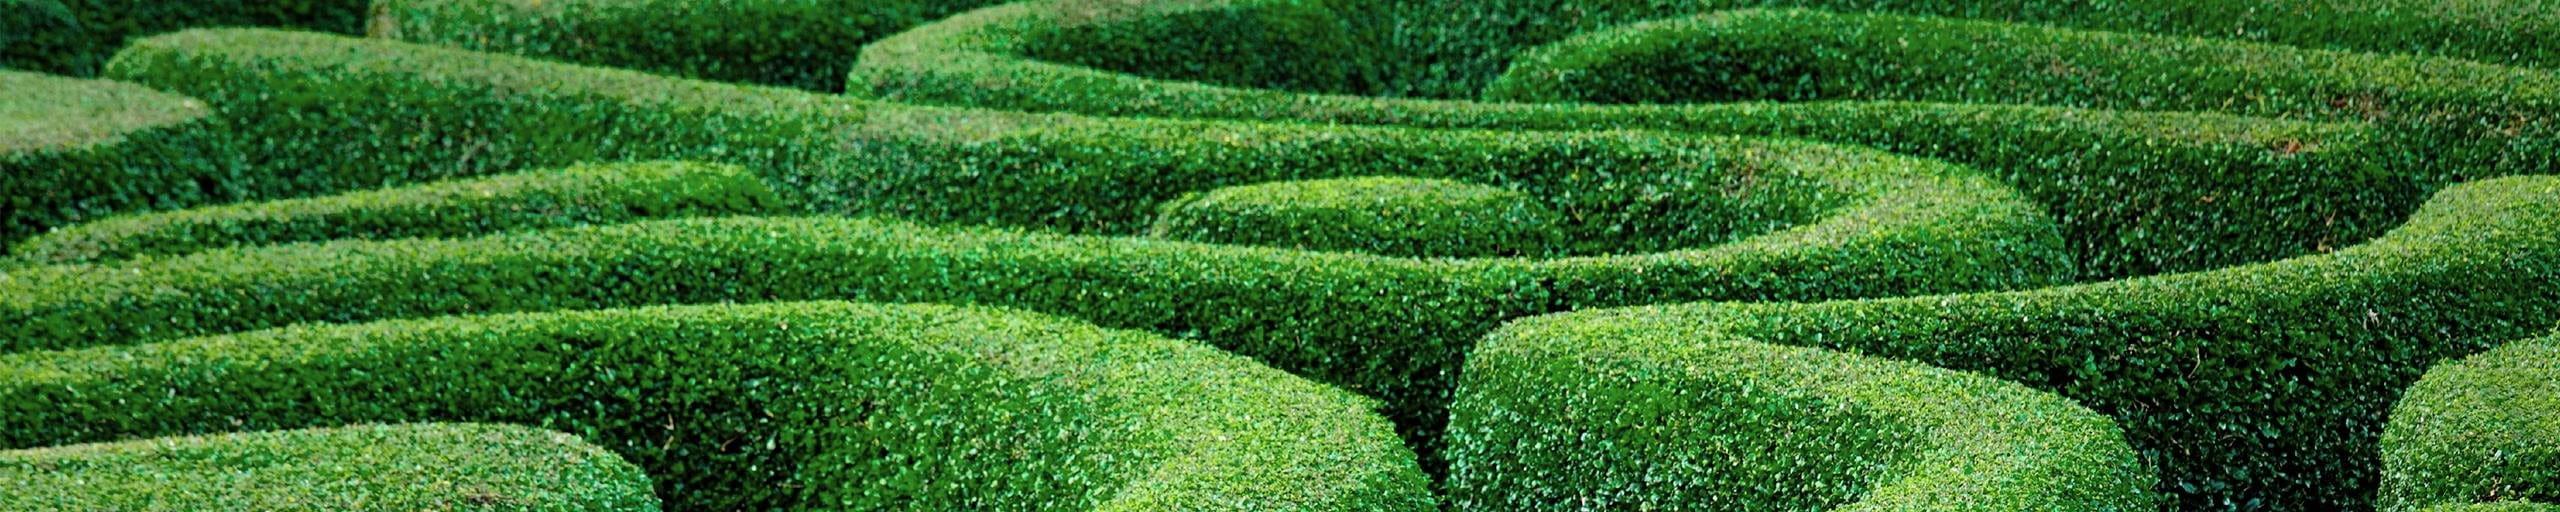 Ein Labyrinth.